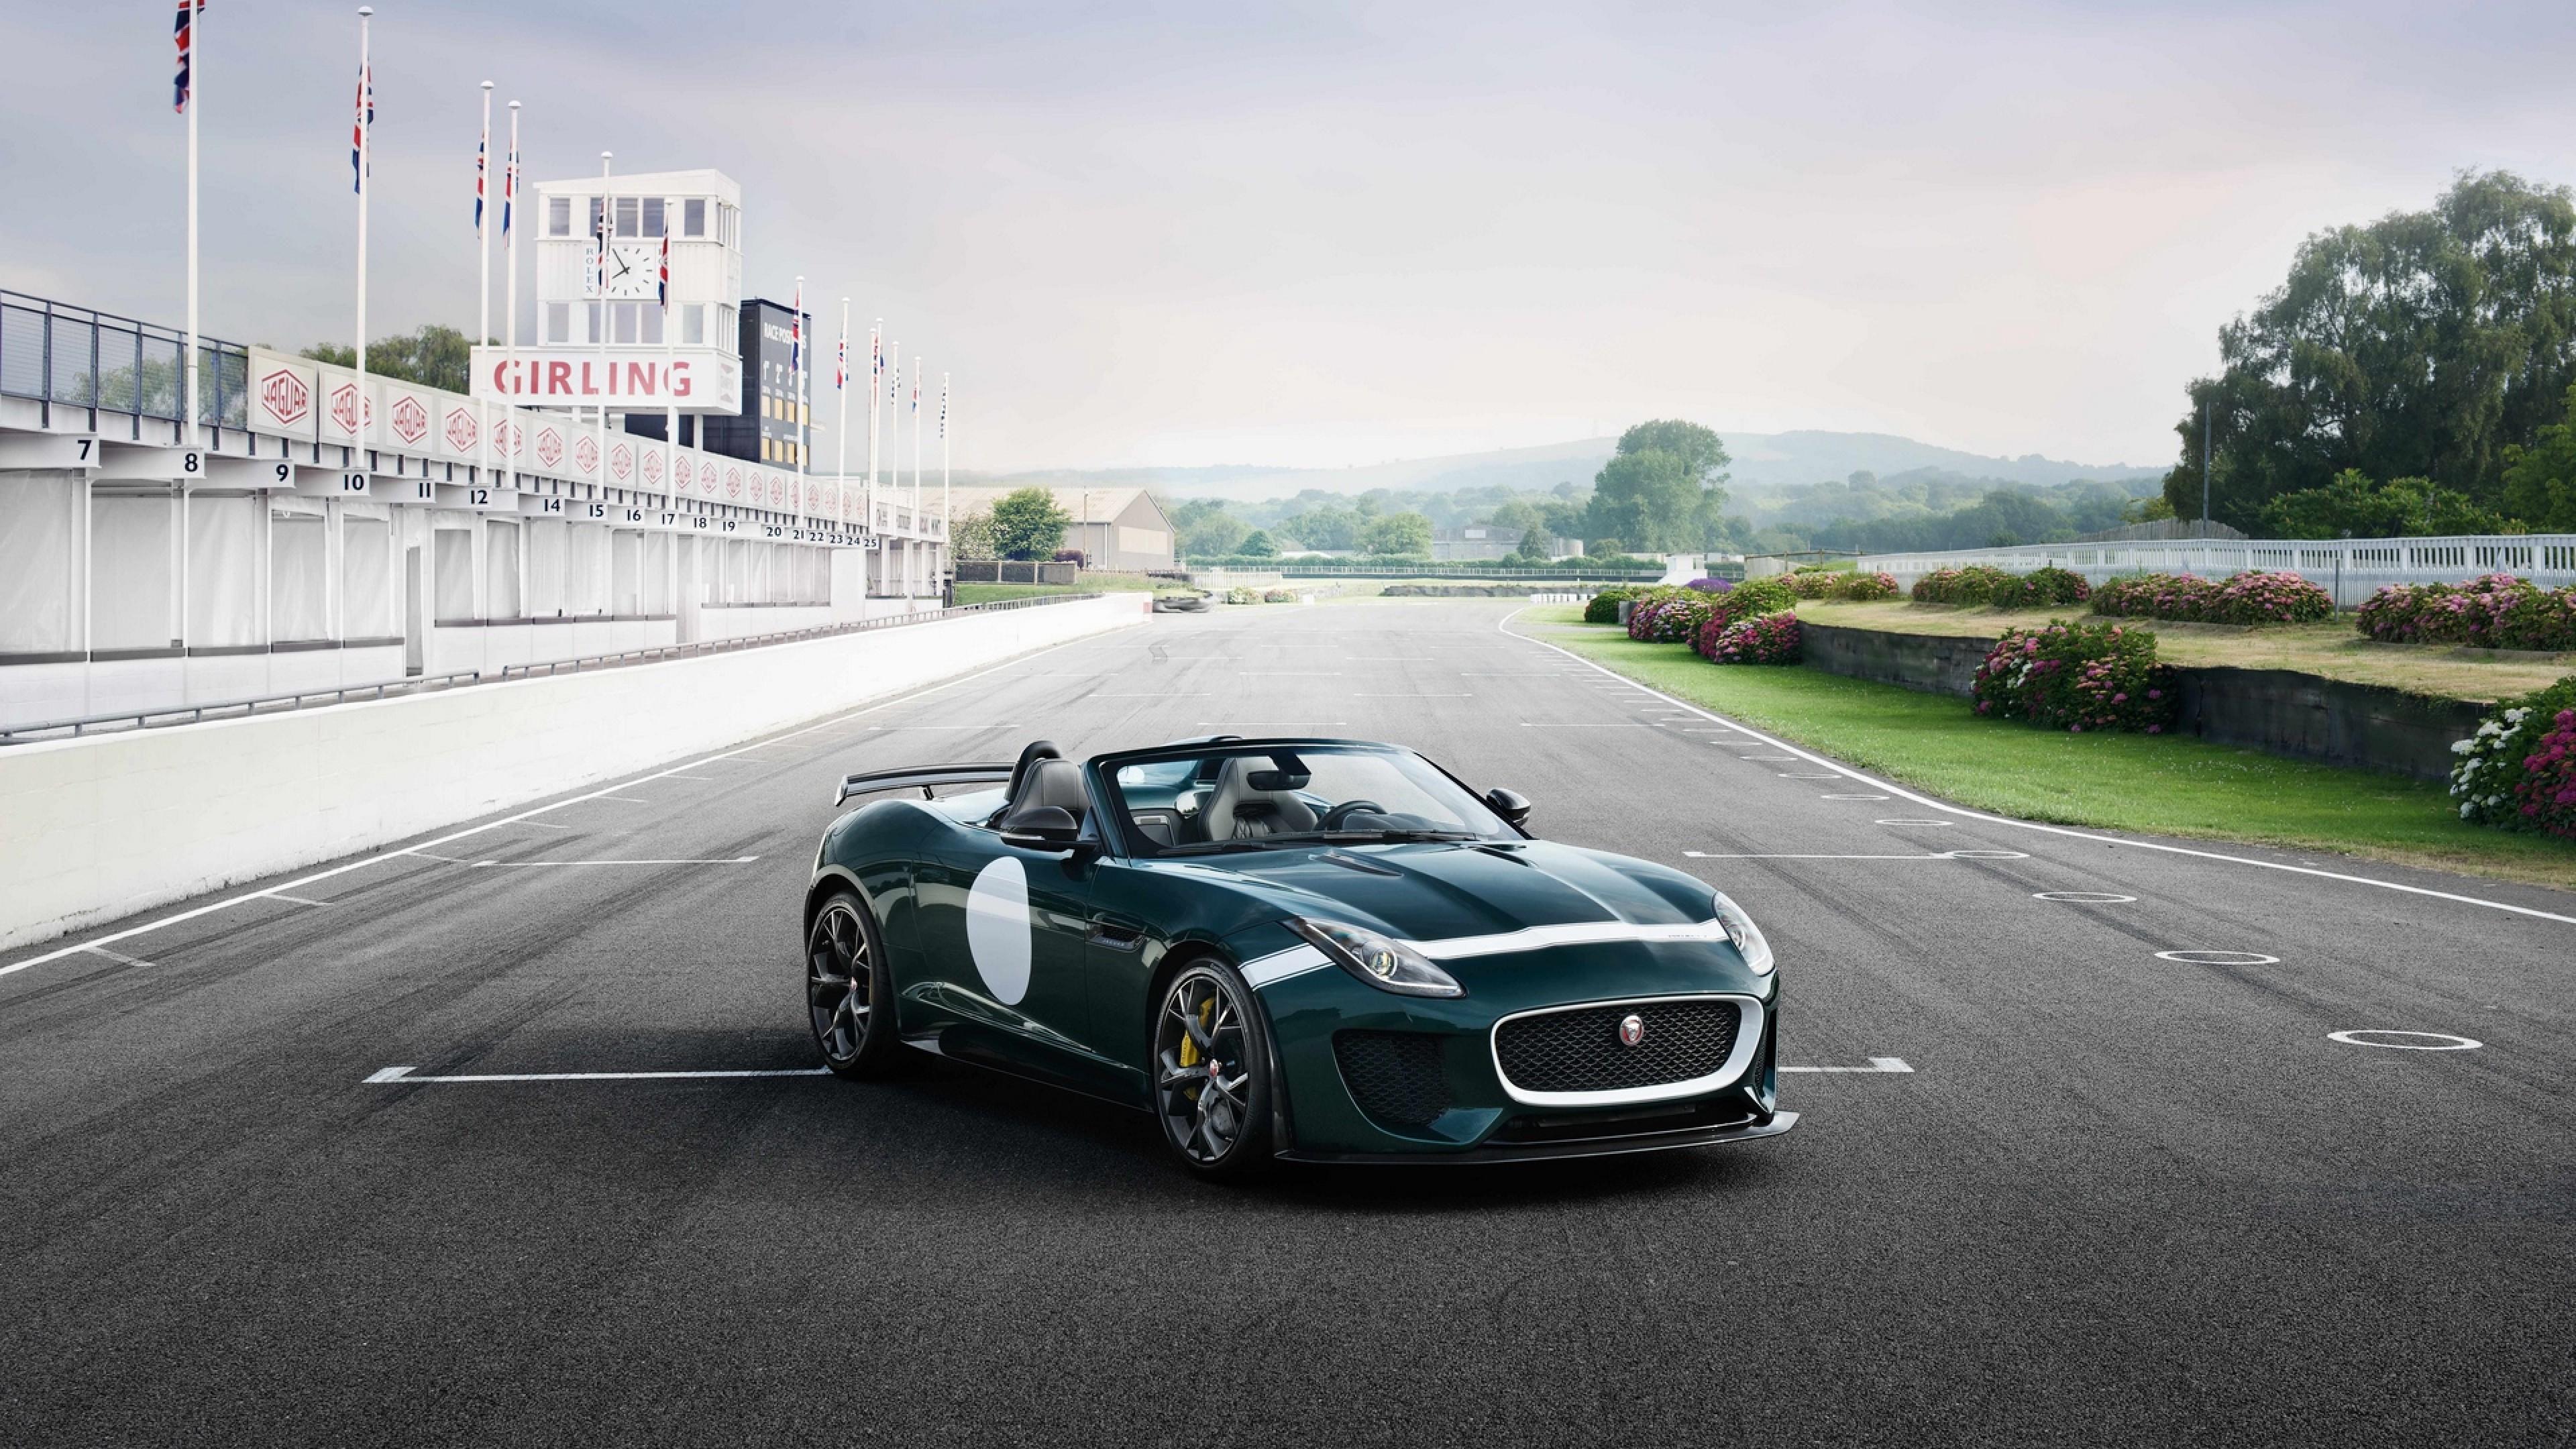 Jaguar F Type Project 7 Hd Wallpaper 4k Ultra Hd Hd